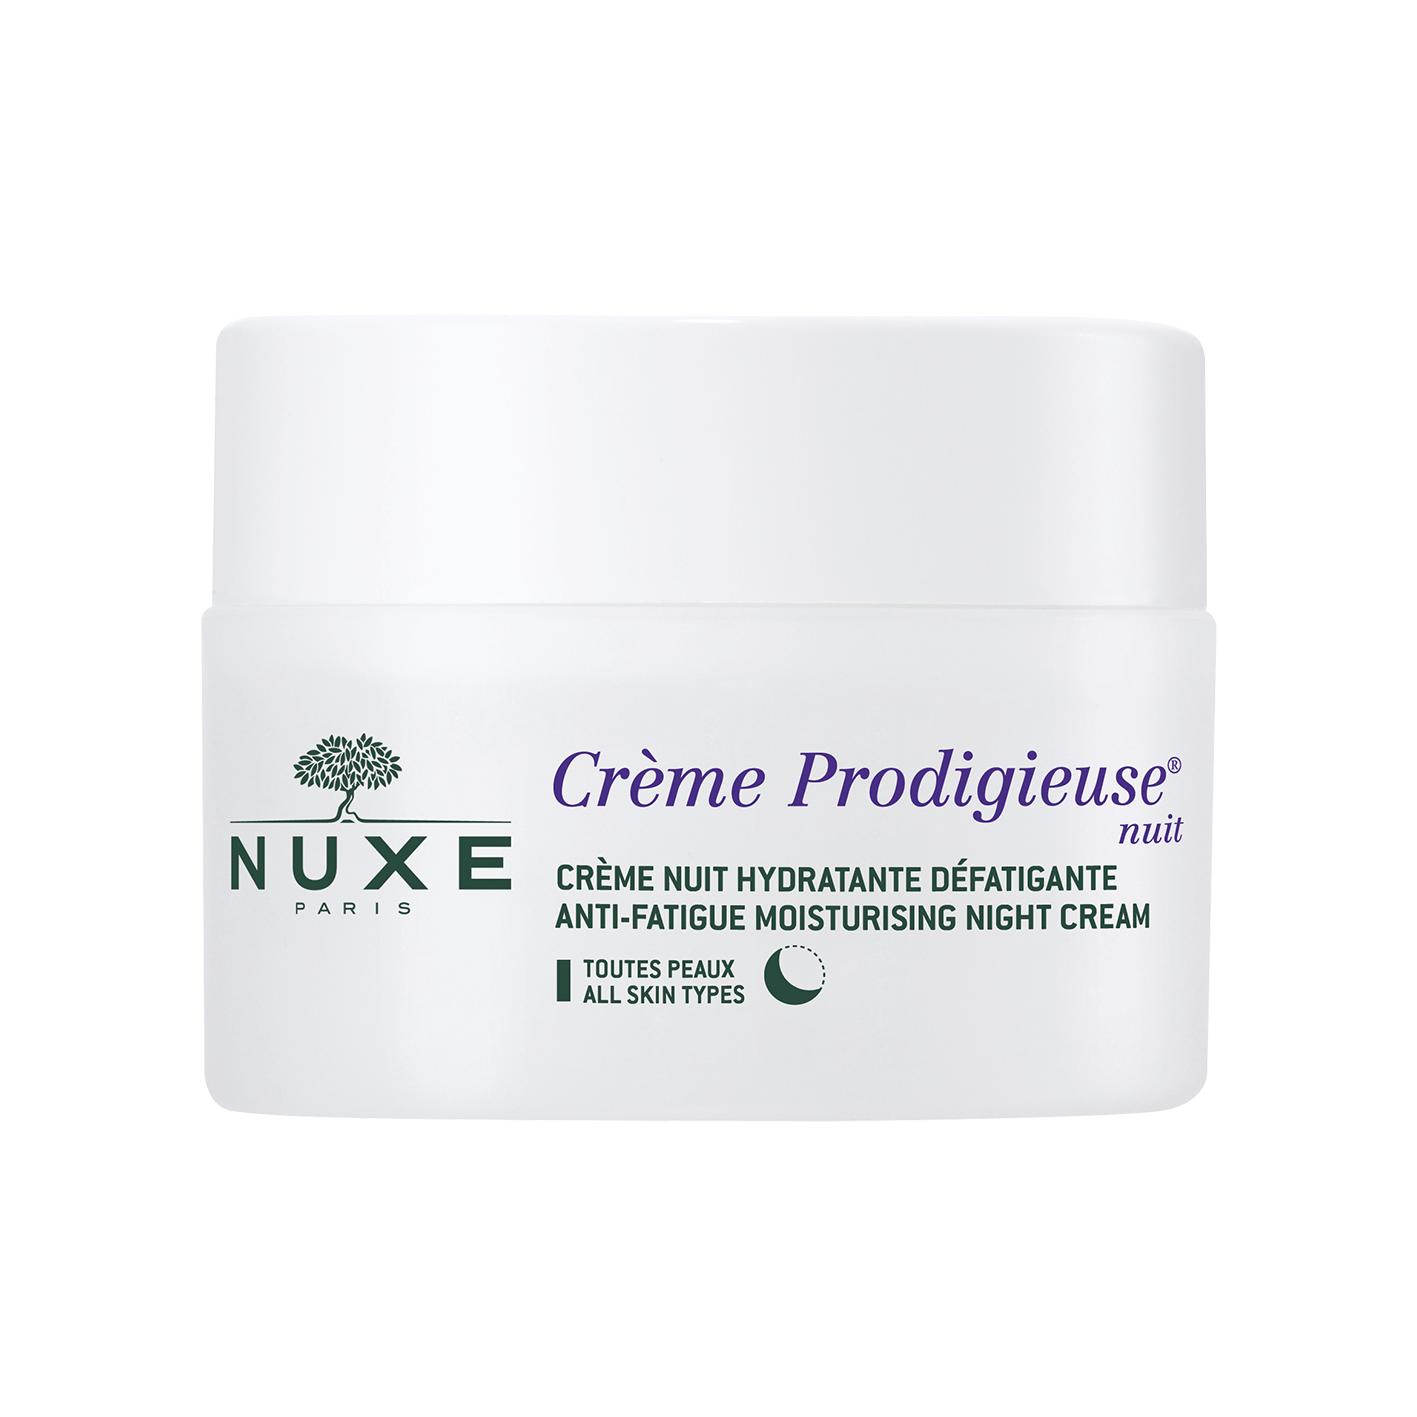 Nuxe Prodigieuse Crème Nuit – Κρέμα Νυκτός για Θρέψη και Ανάπλαση του Δέρματος 50ml